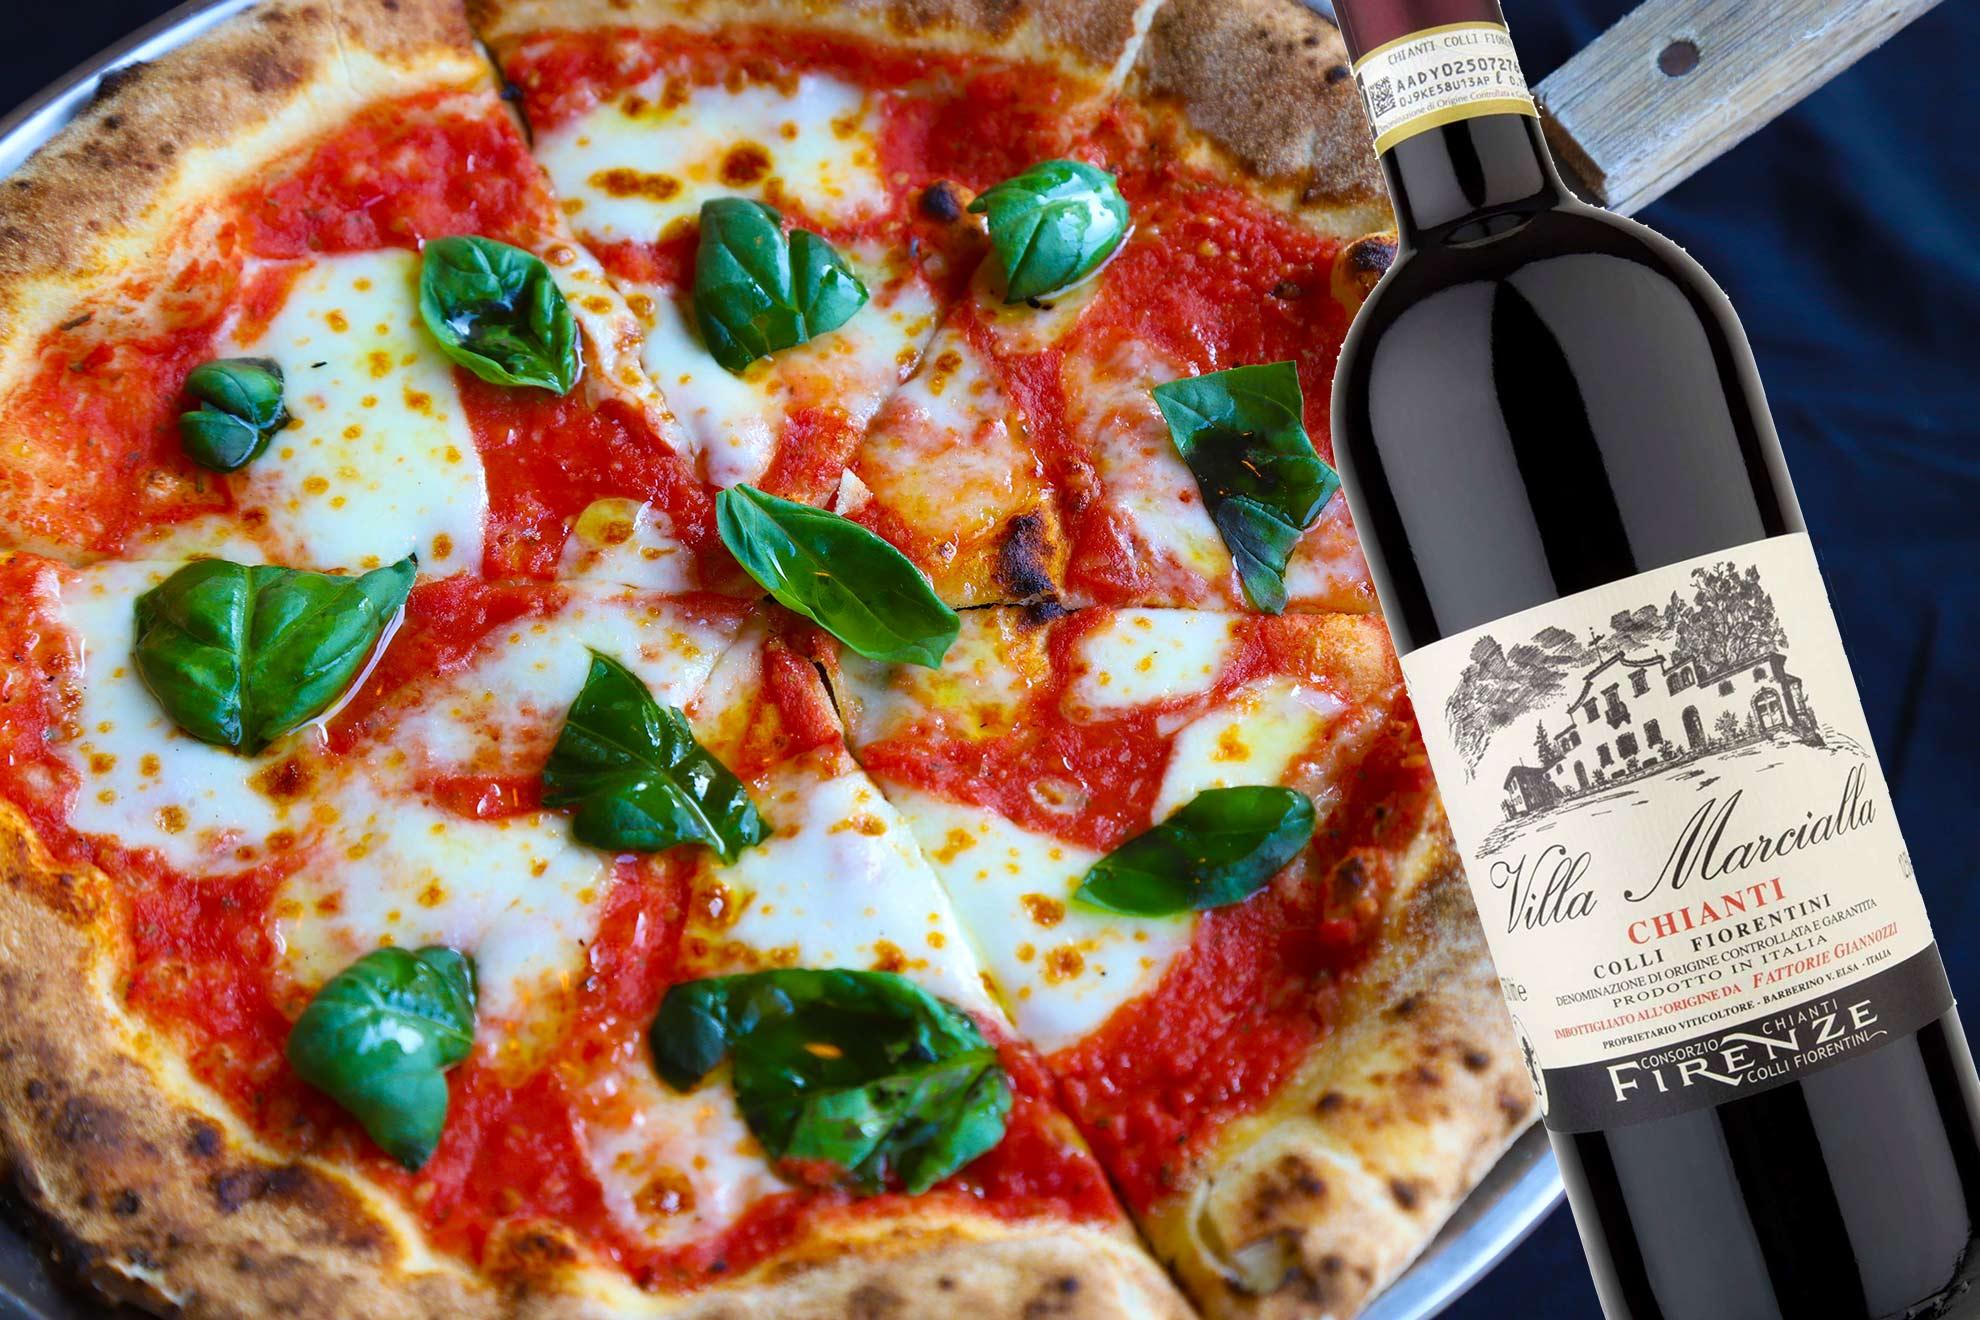 Pizzaviini: Pizza margarita ja klassinen Chianti